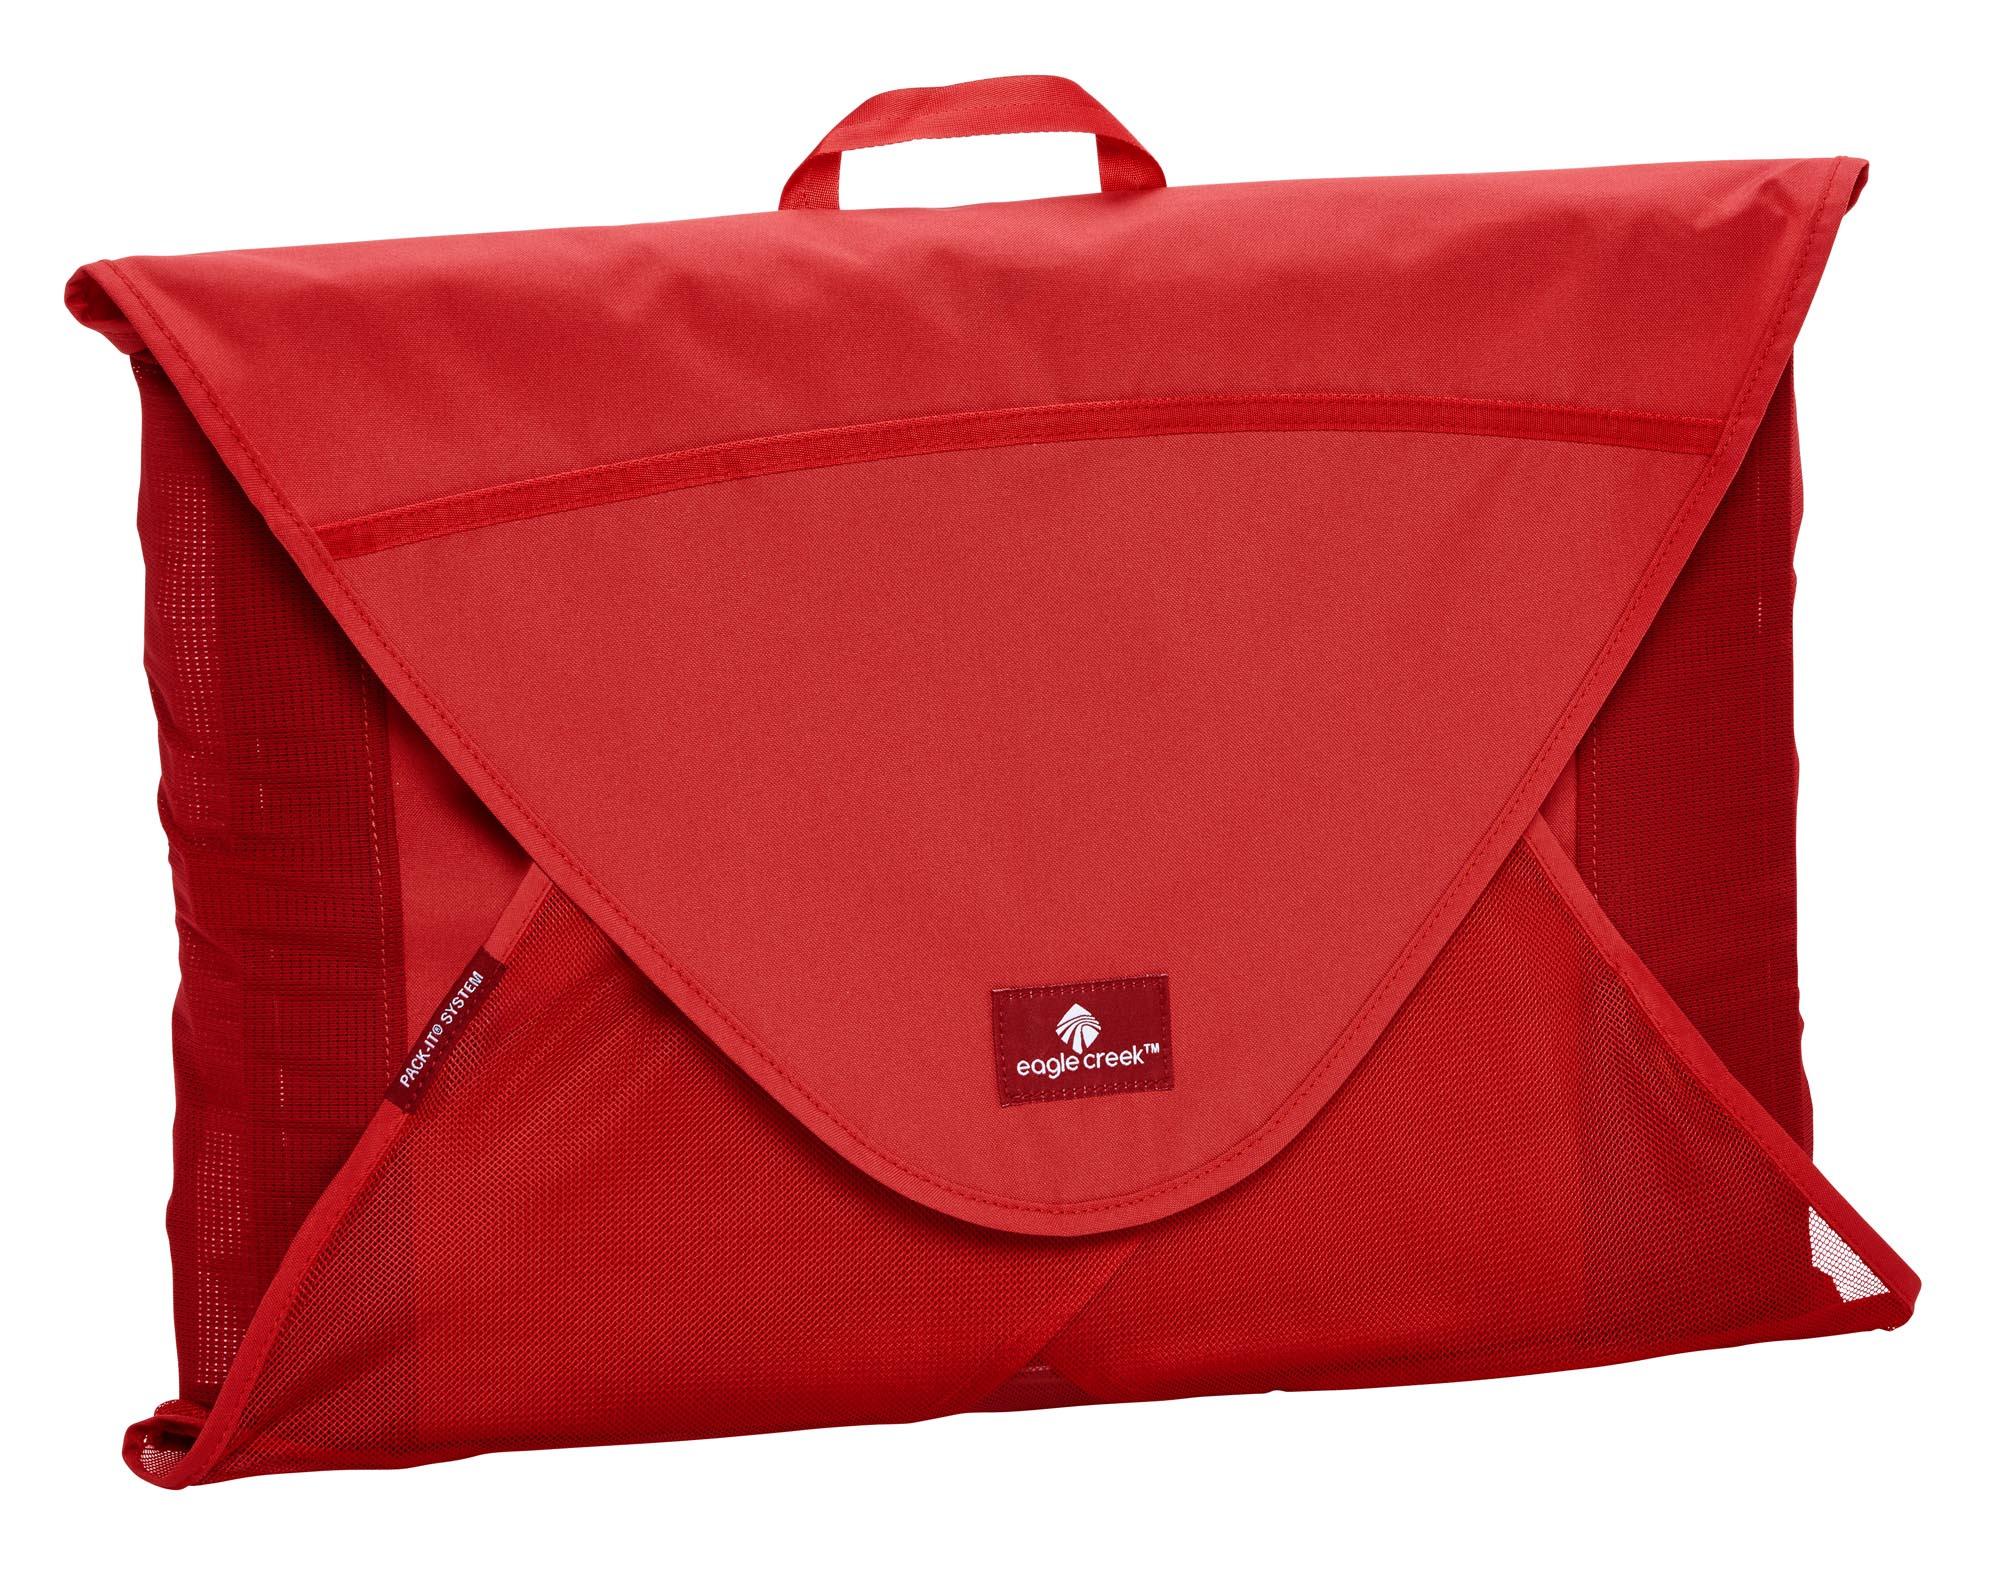 EagleCreek - Pack-It Garment Folder Large Red Fire - Packing Bags -